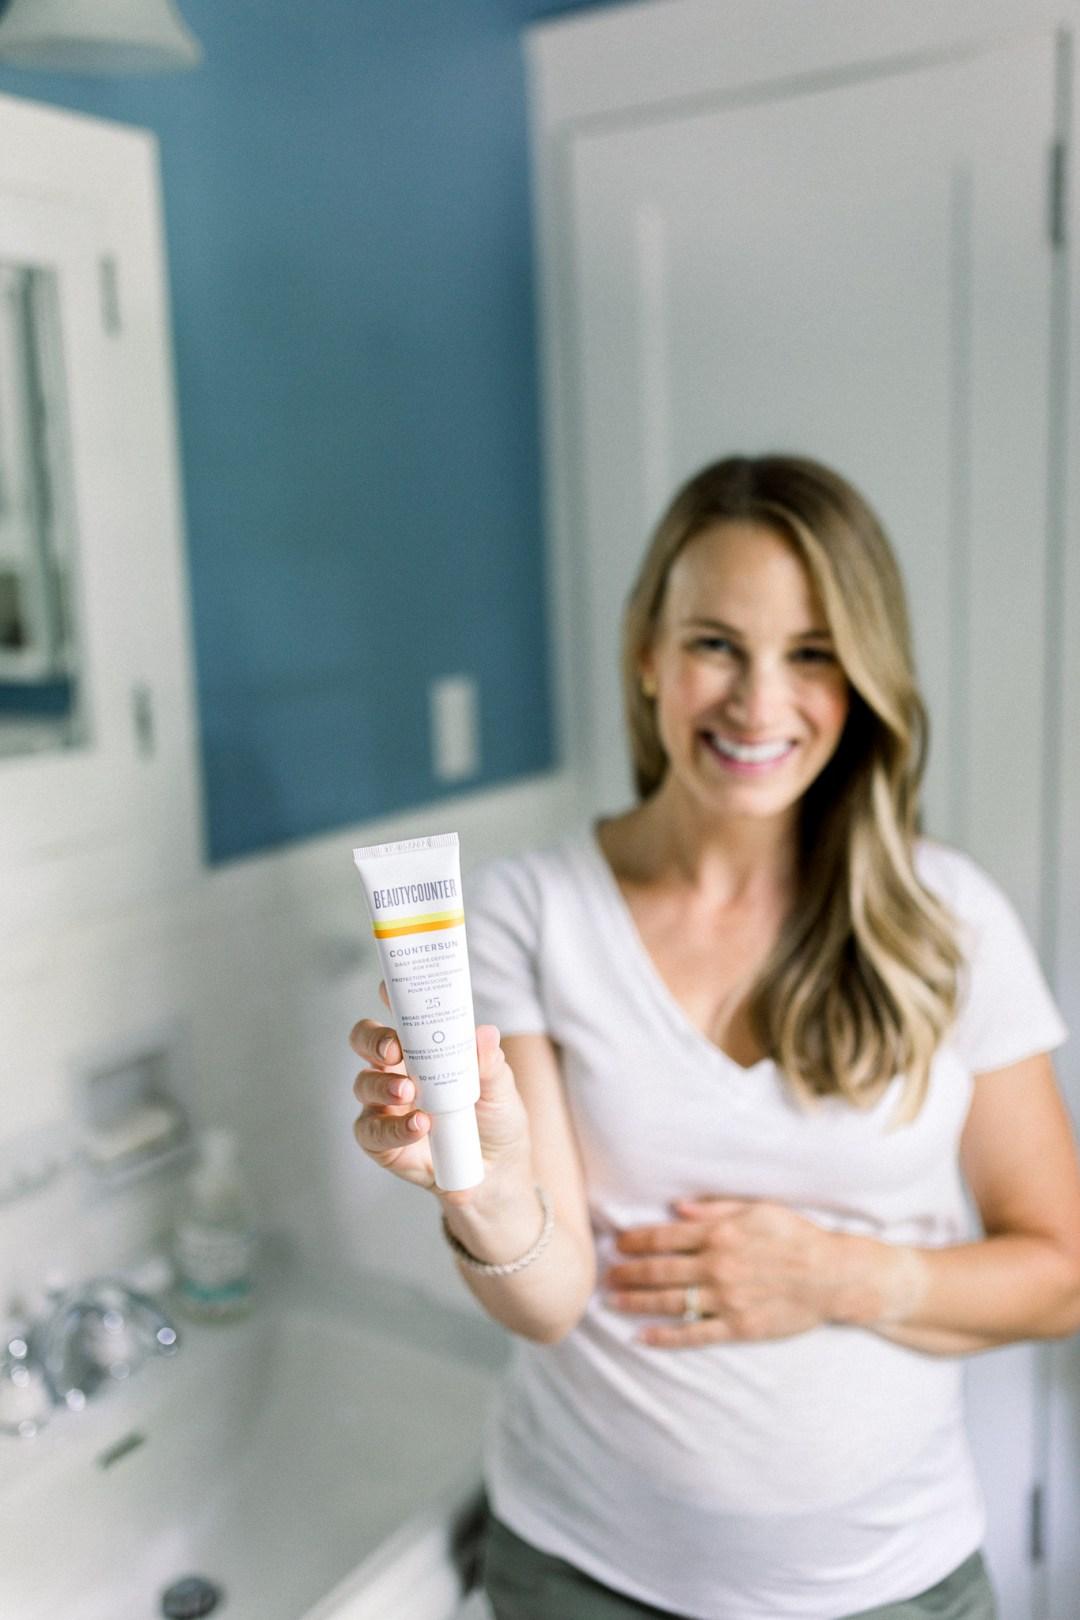 Beautycounter Countersun Daily Sheer Defense Review